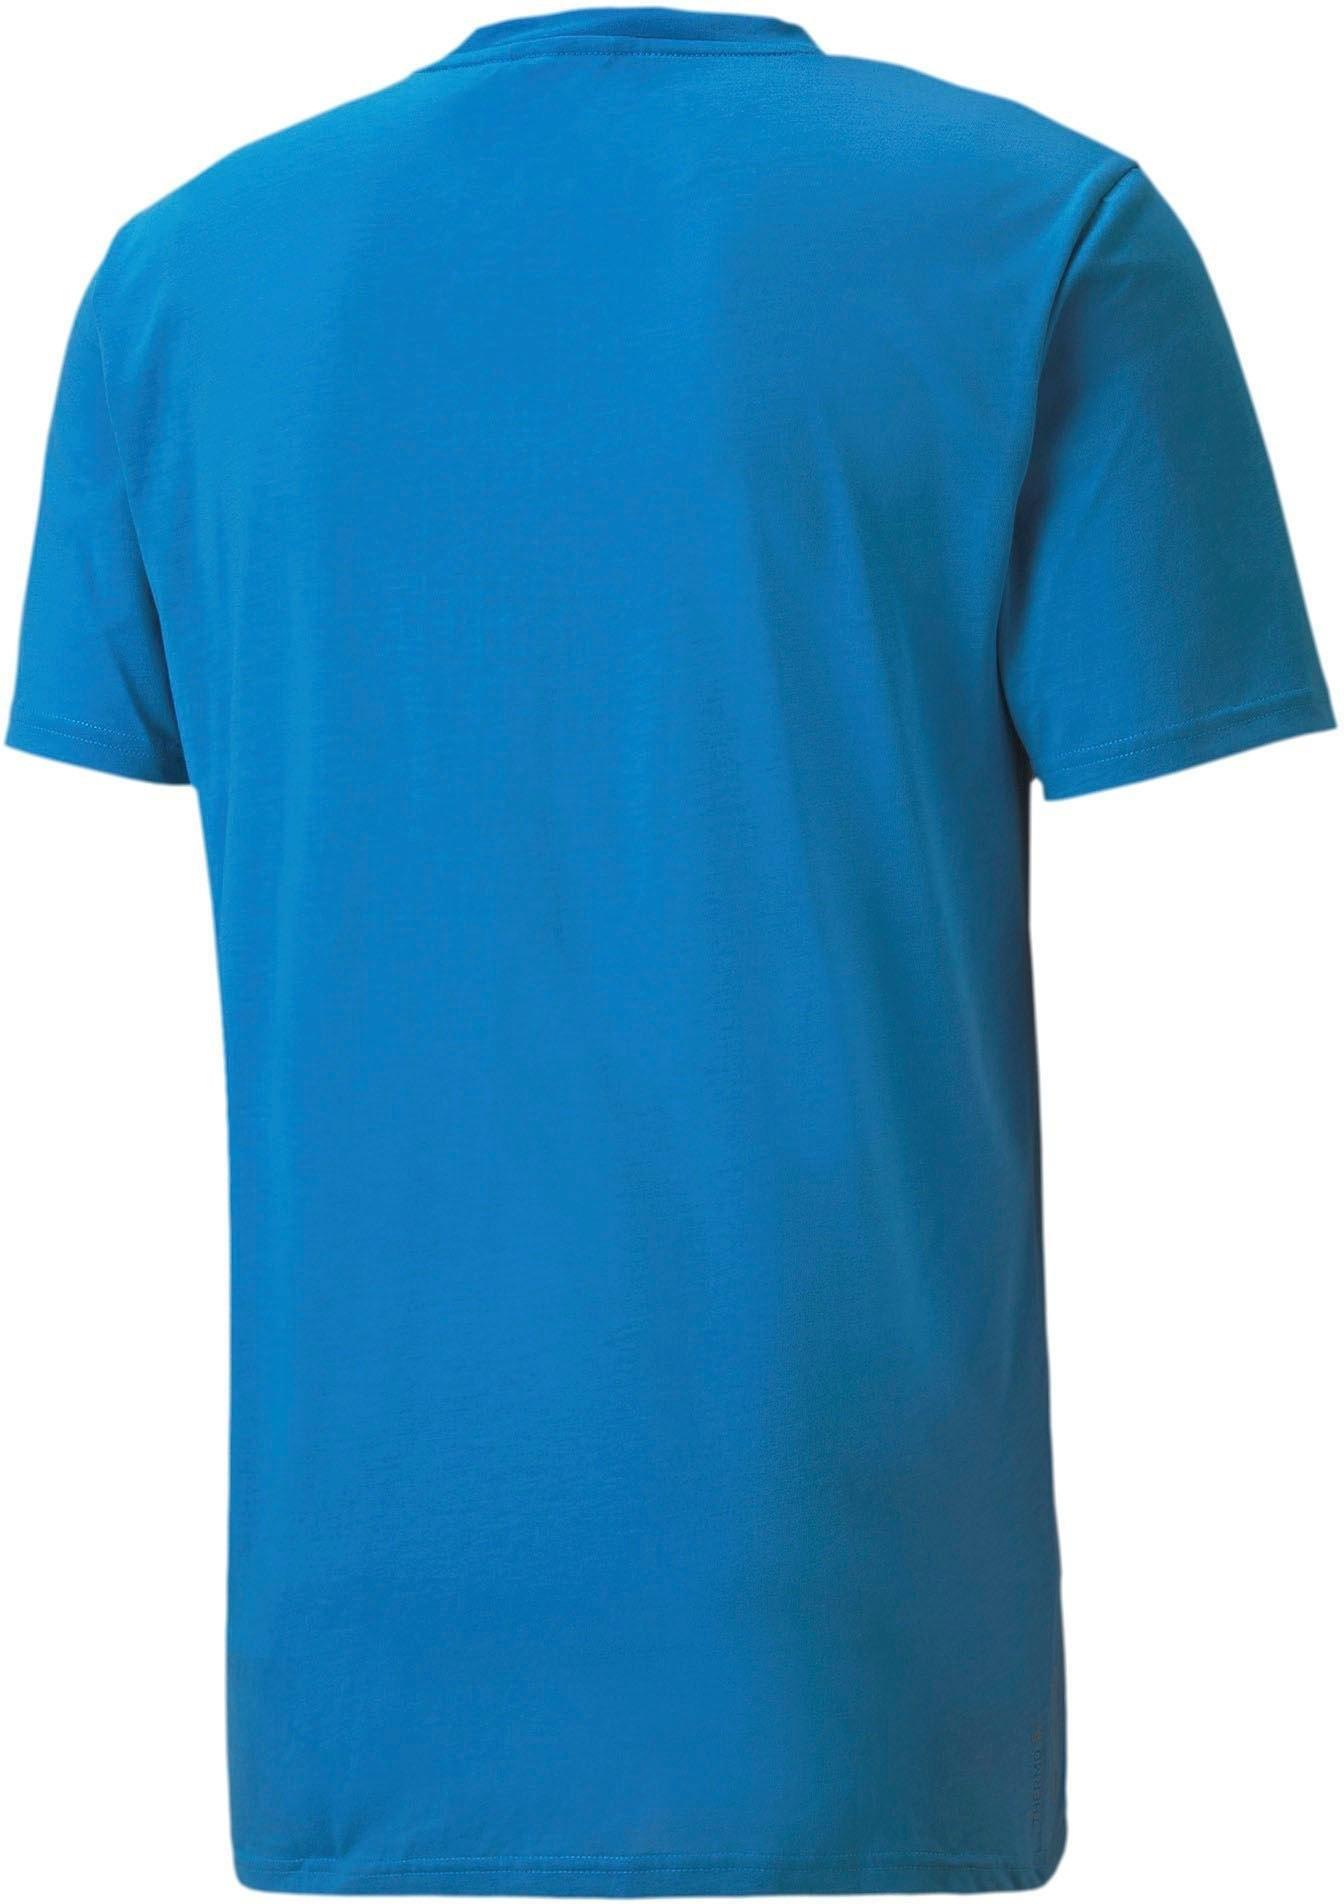 Puma trainingsshirt »TRAIN THERMO R+ BND SHORT SLEEVE TE« online kopen op otto.nl